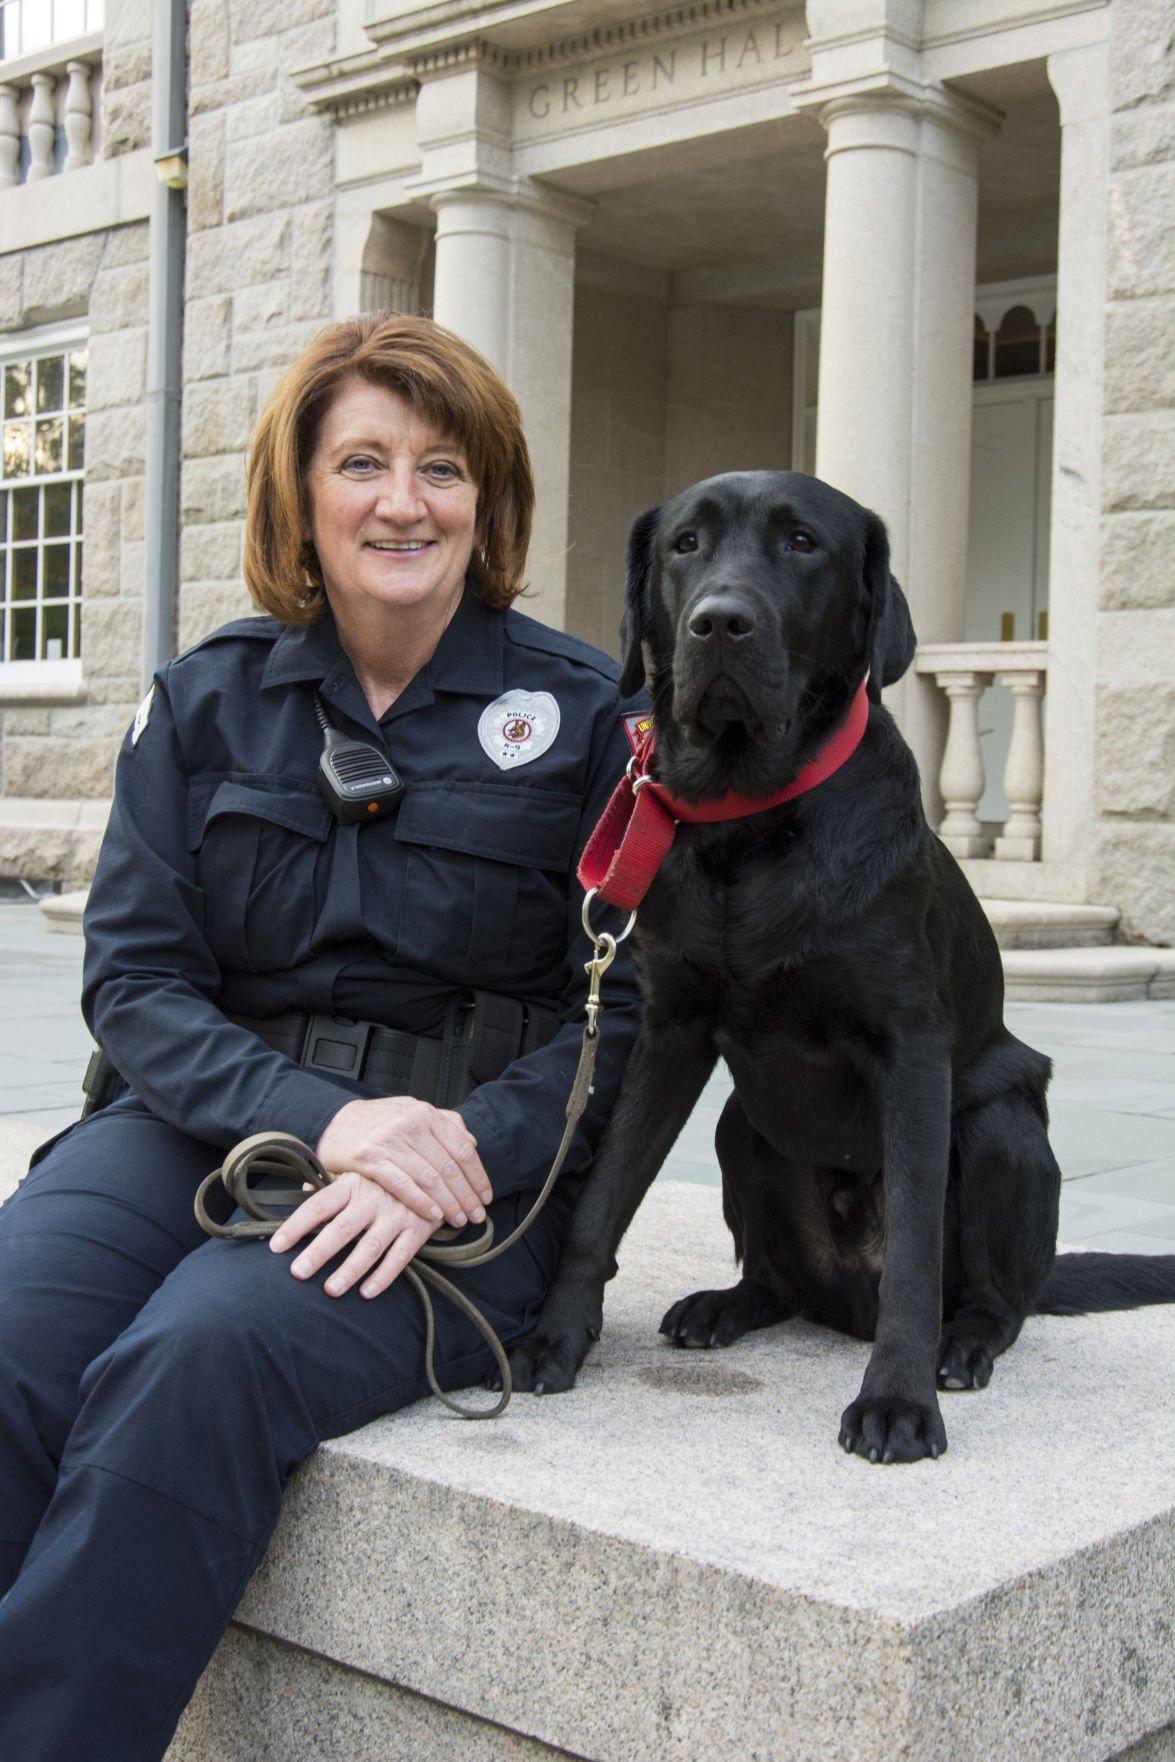 Sergeant Erica Viera with Figaro